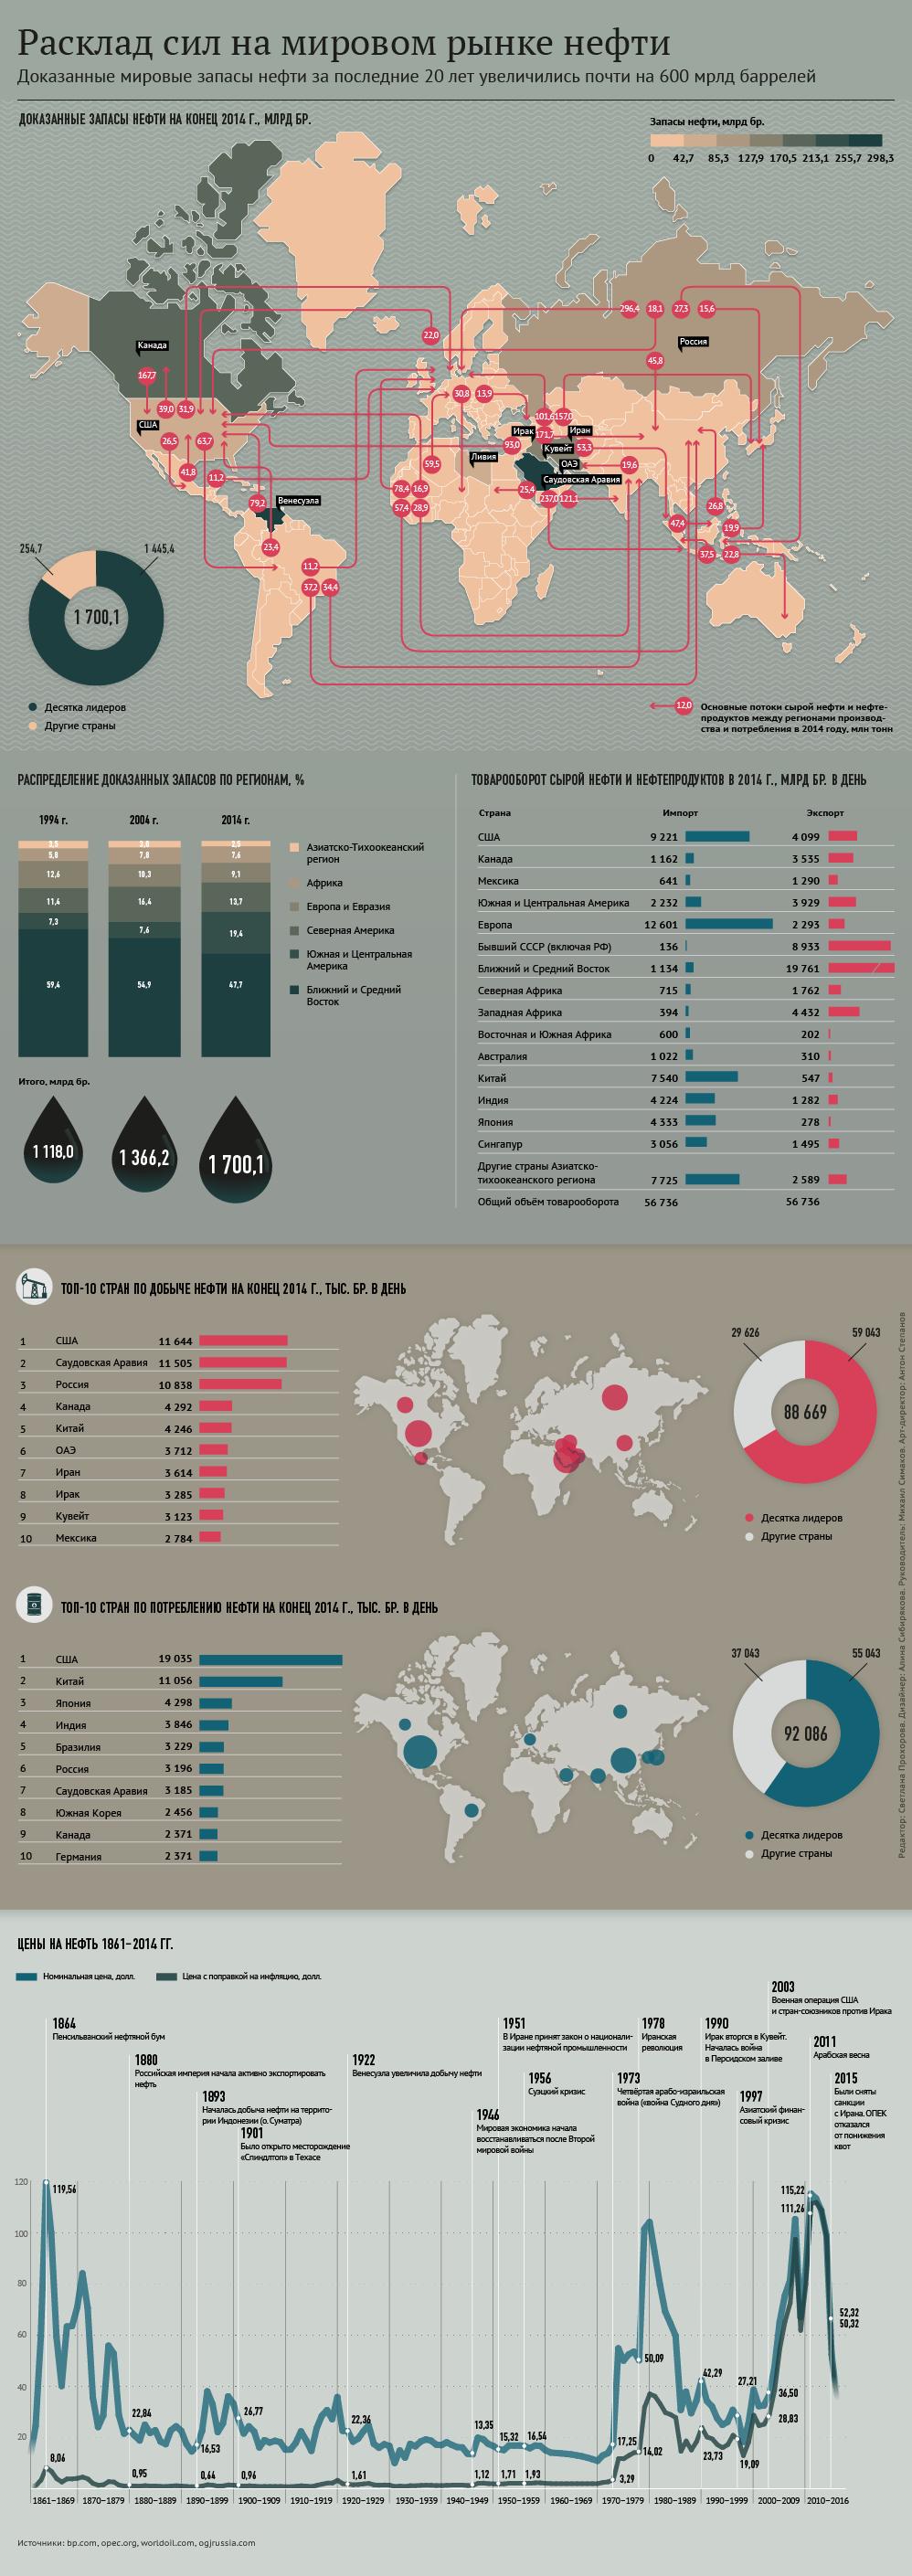 Расклад сил на мировом рынке нефти